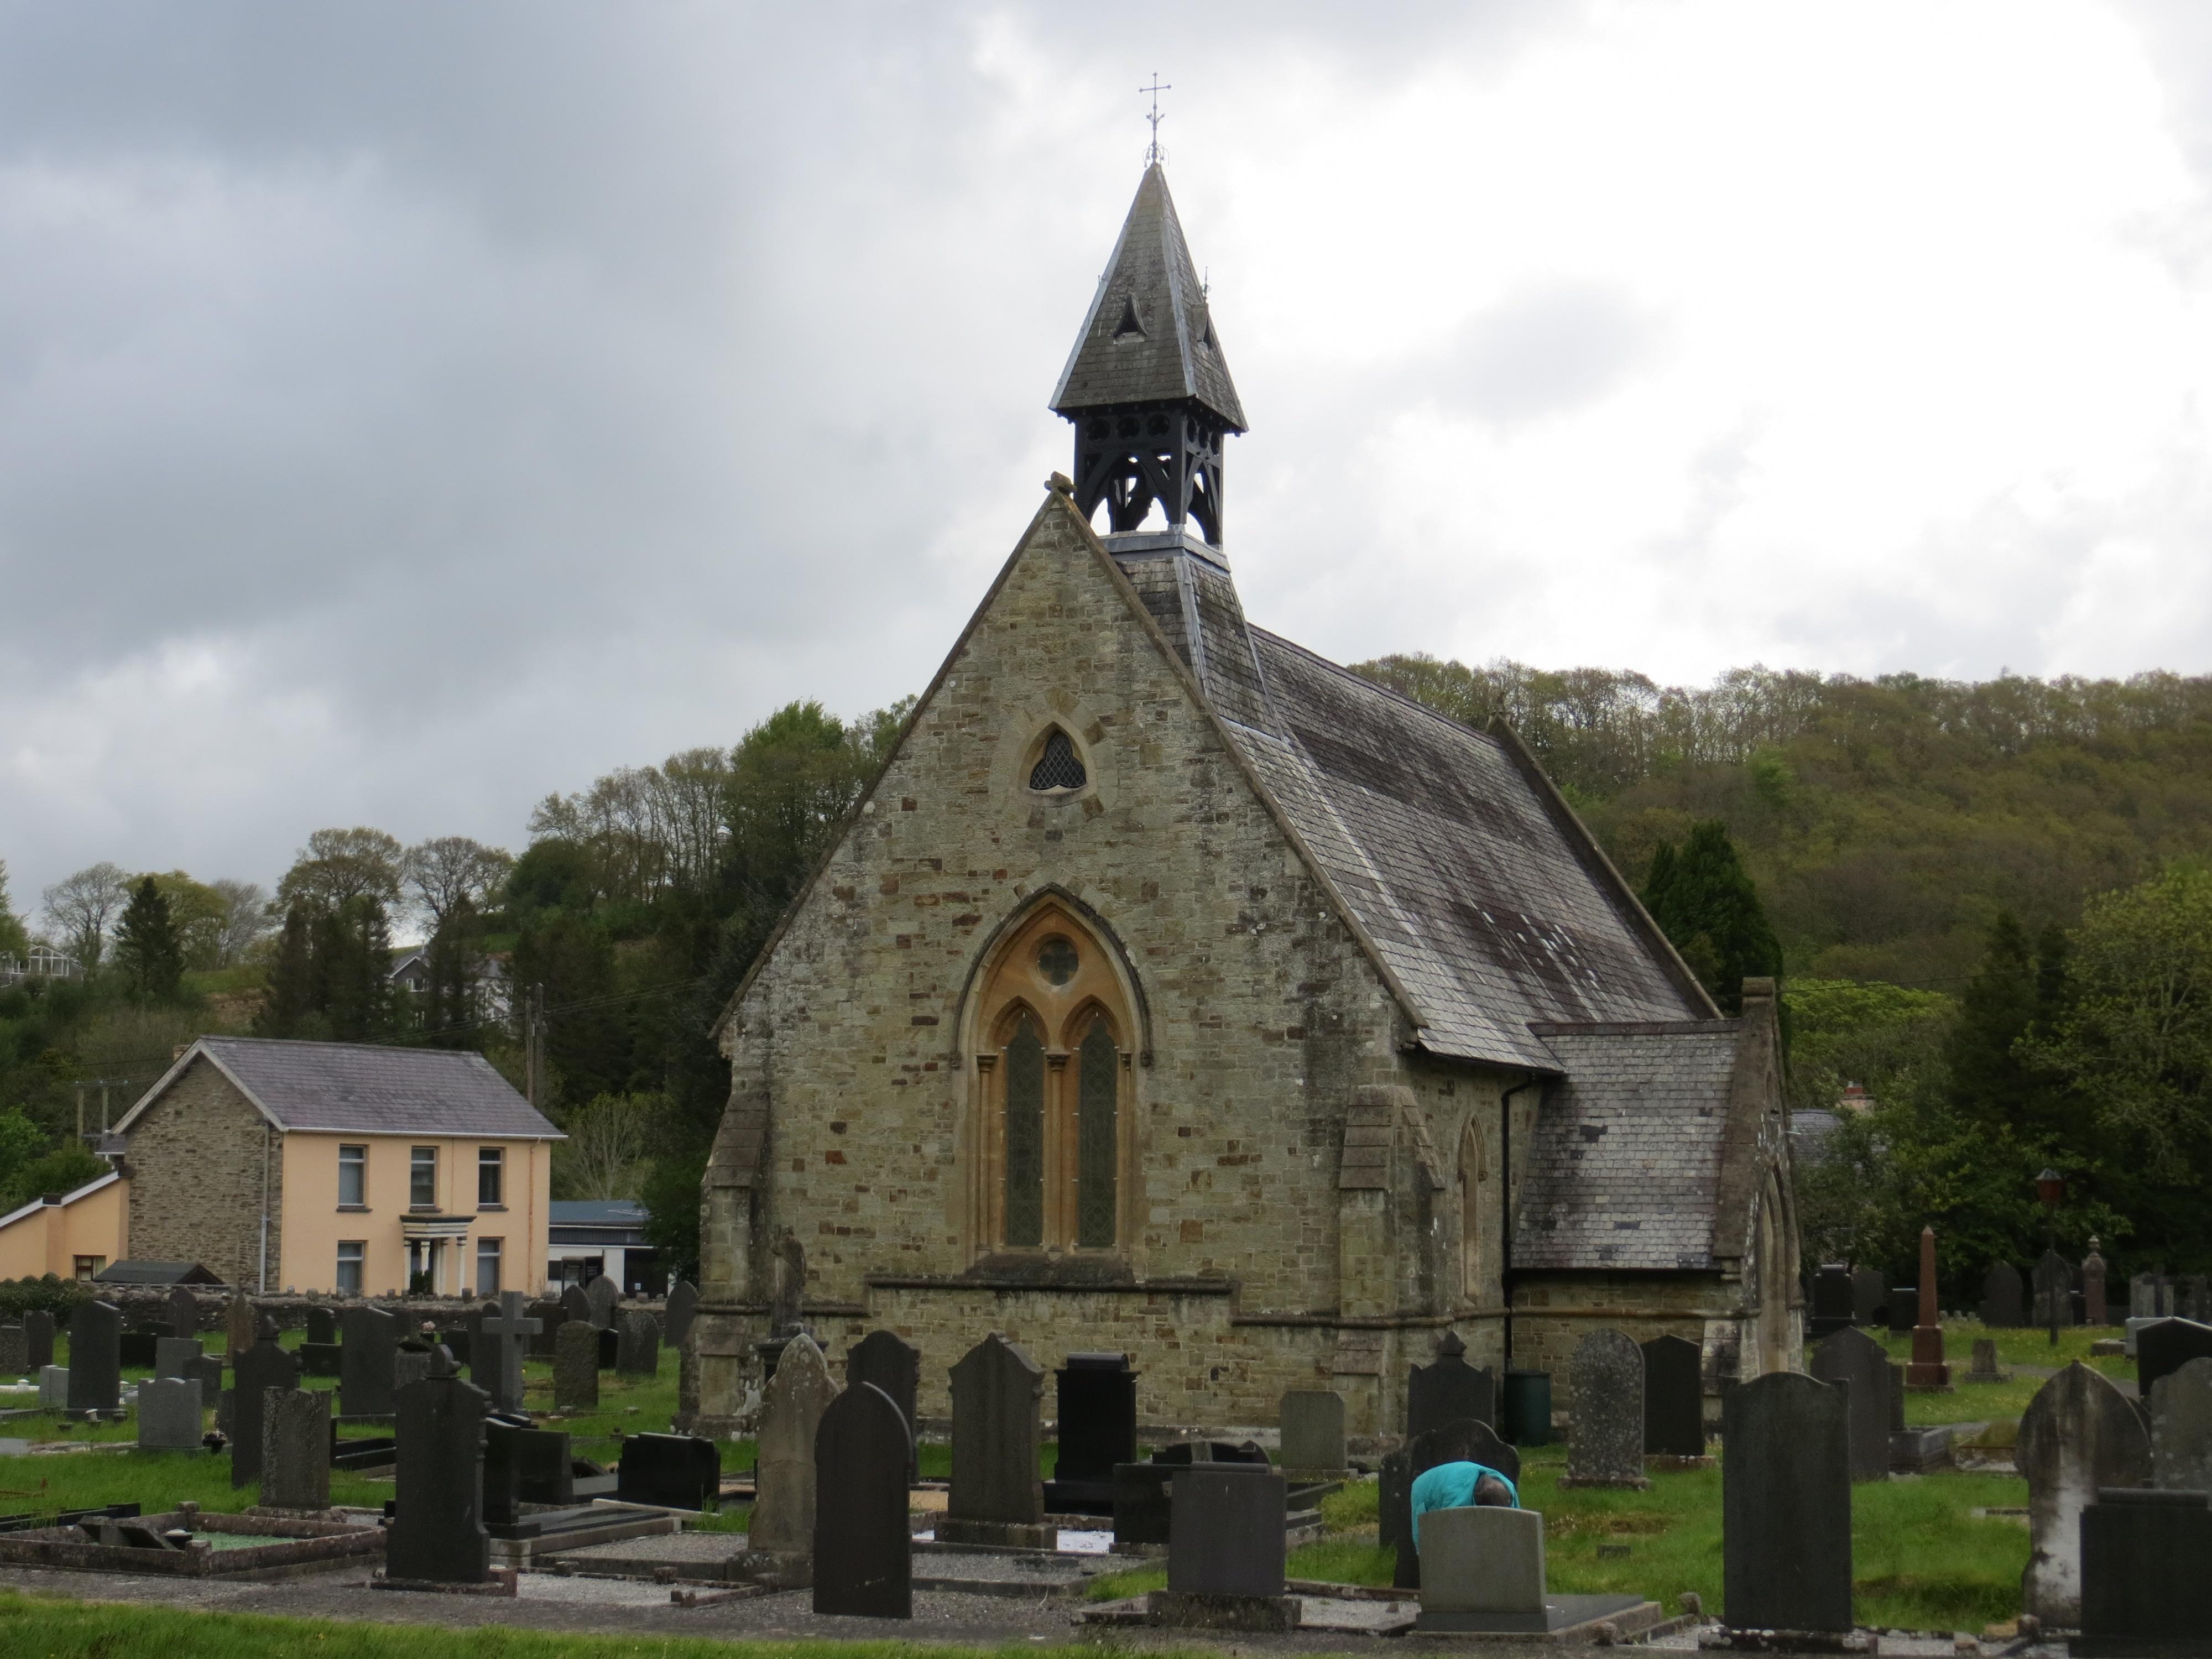 Wales, DREFACH FELINDRE, St Barnabas (c Peter Wood)